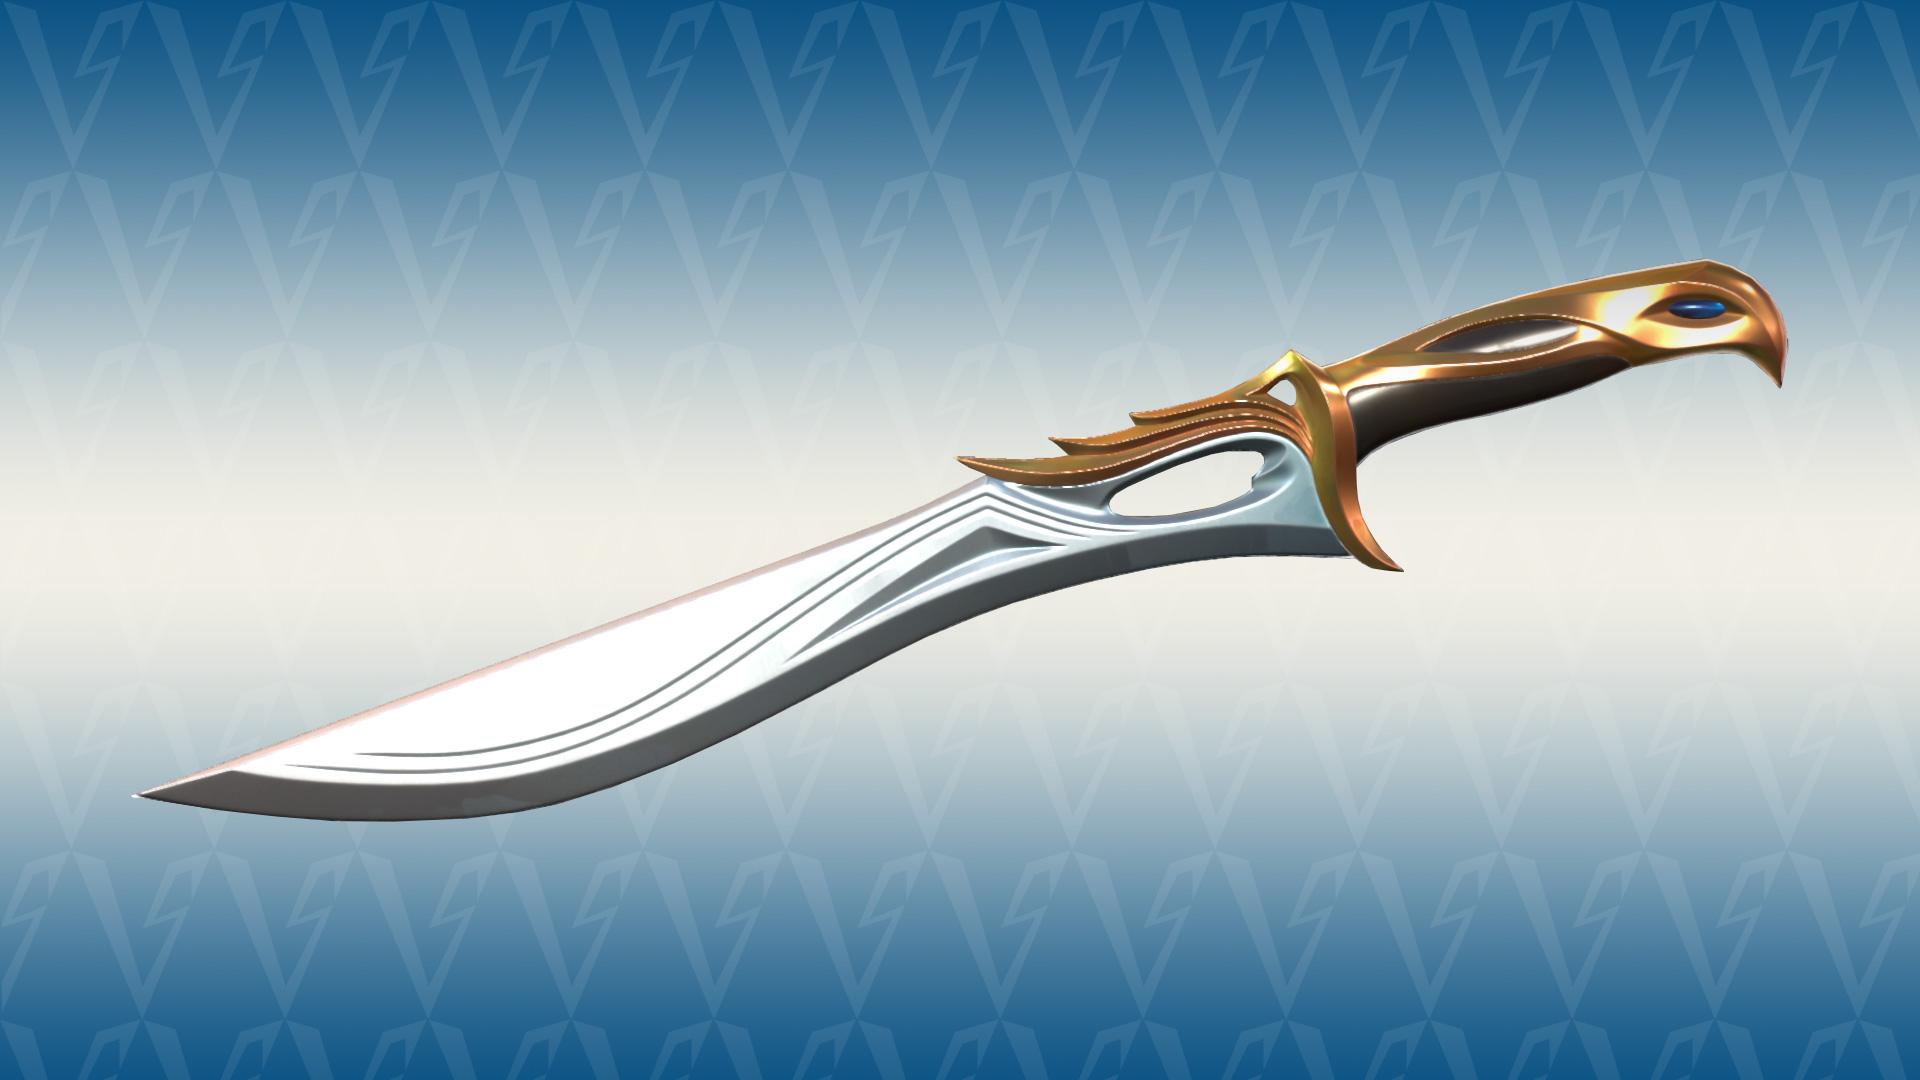 Valorant Sovereign Knife HD